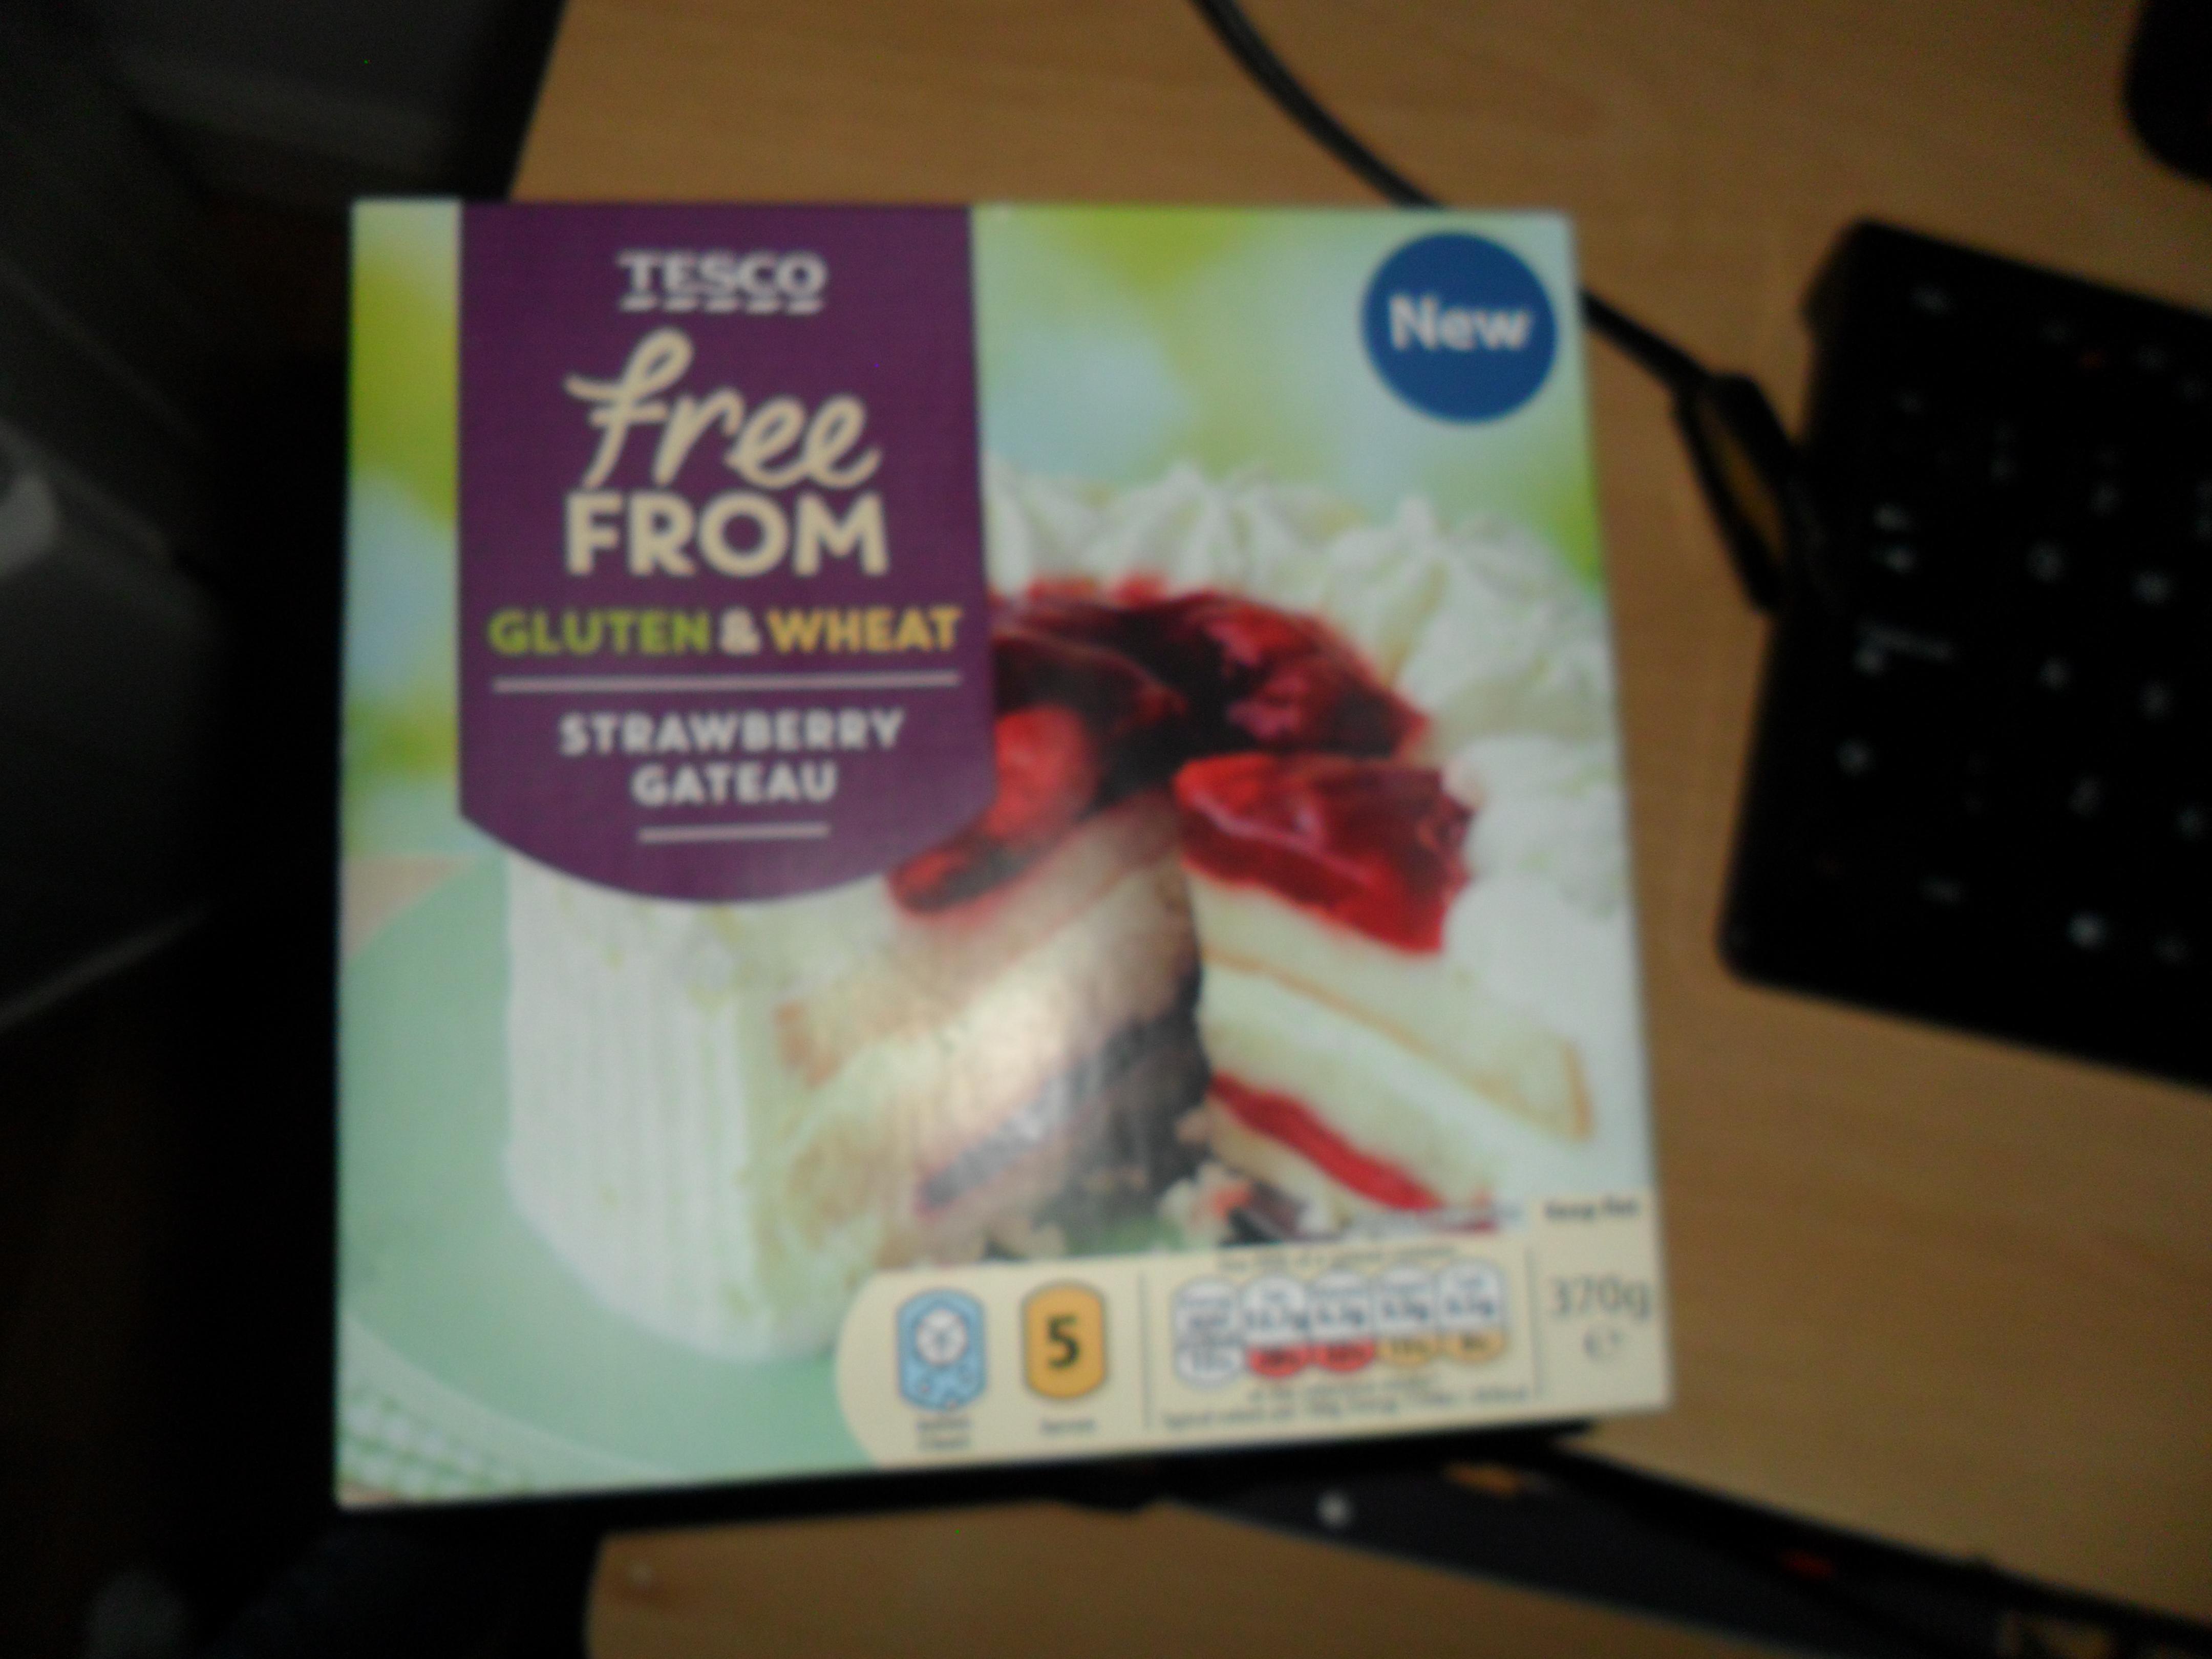 Free from Gluten & Wheat strawberry Gateau 20p @ Tesco Hamilton Estate Leicester